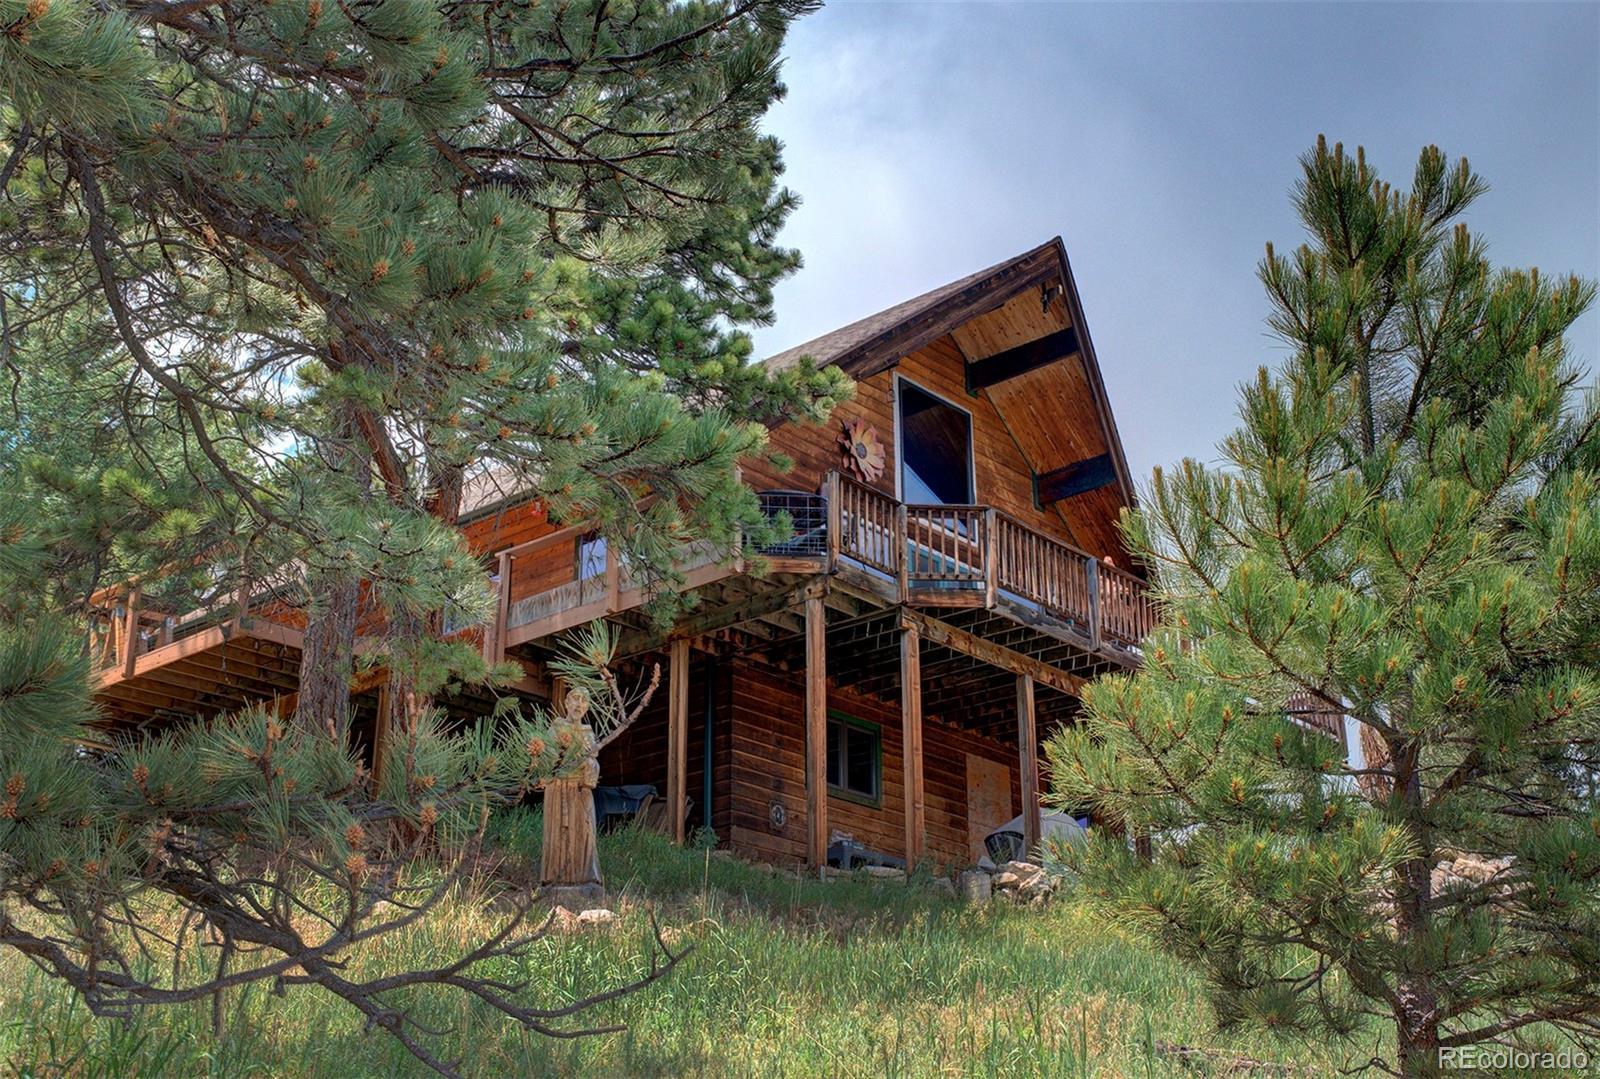 MLS# 6922377 - 1 - 12123 Geronimo Trail, Conifer, CO 80433